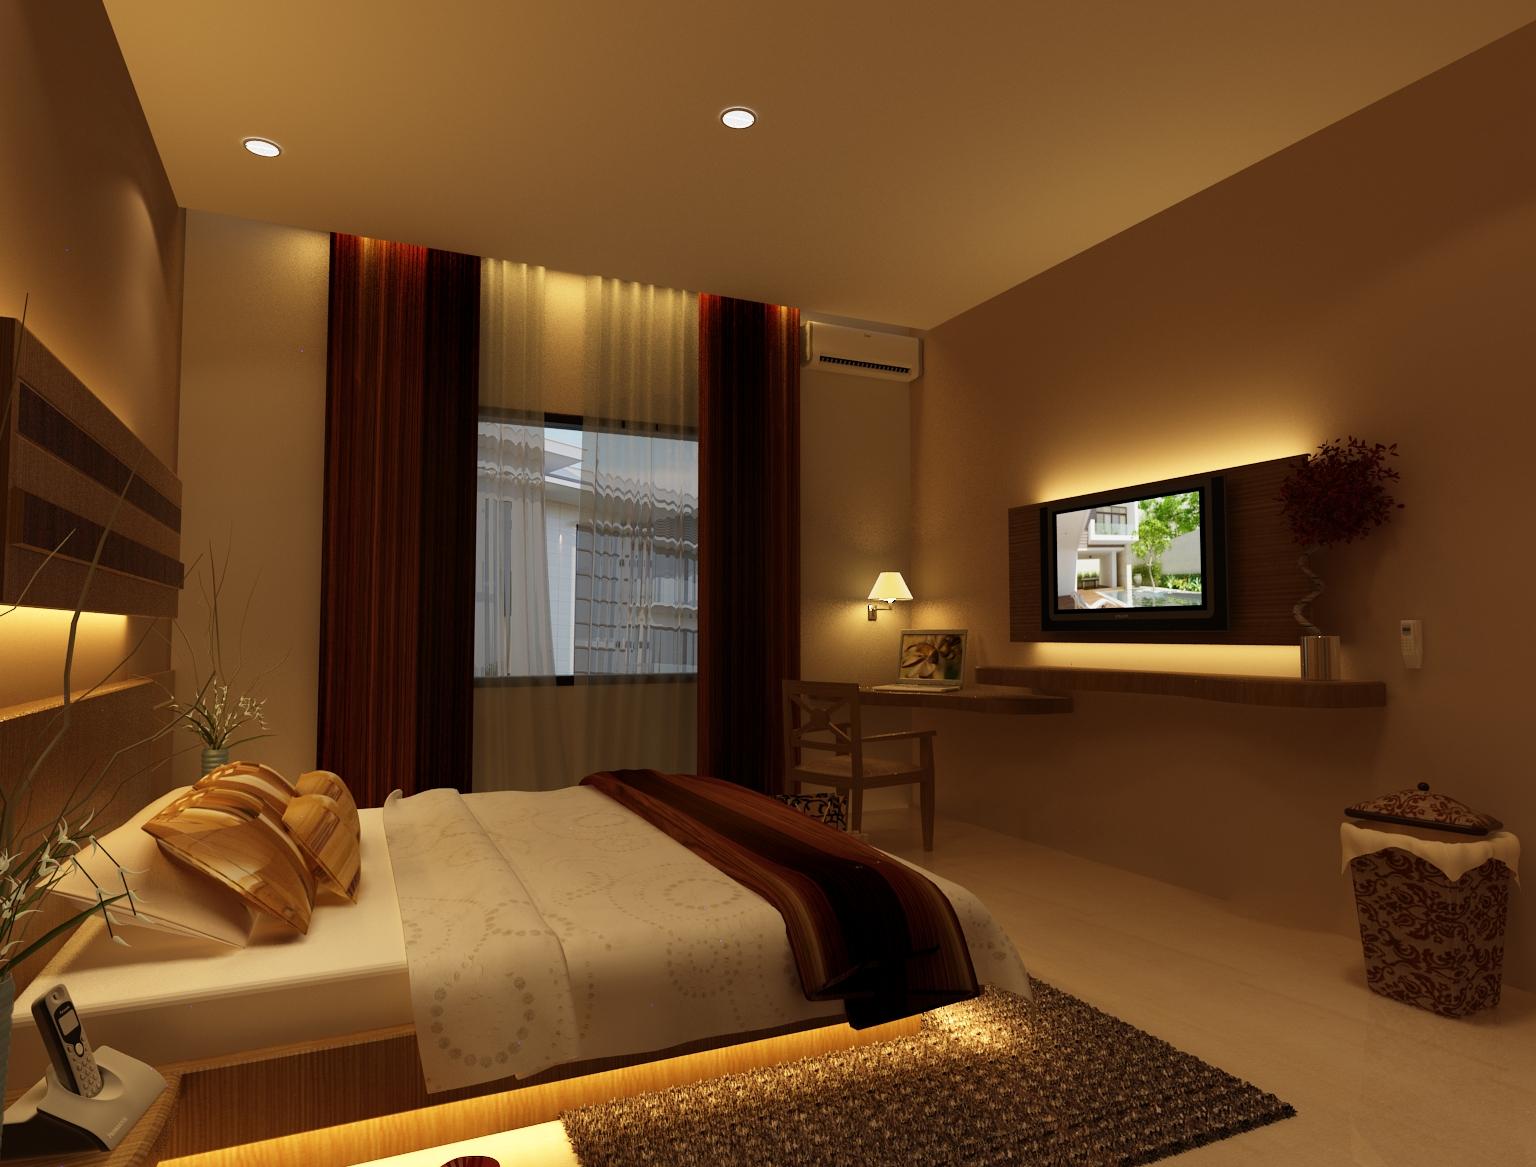 Contoh Desain Kamar Hotel Plaza Surabaya II  INTERIOR DIFASI LESTARI